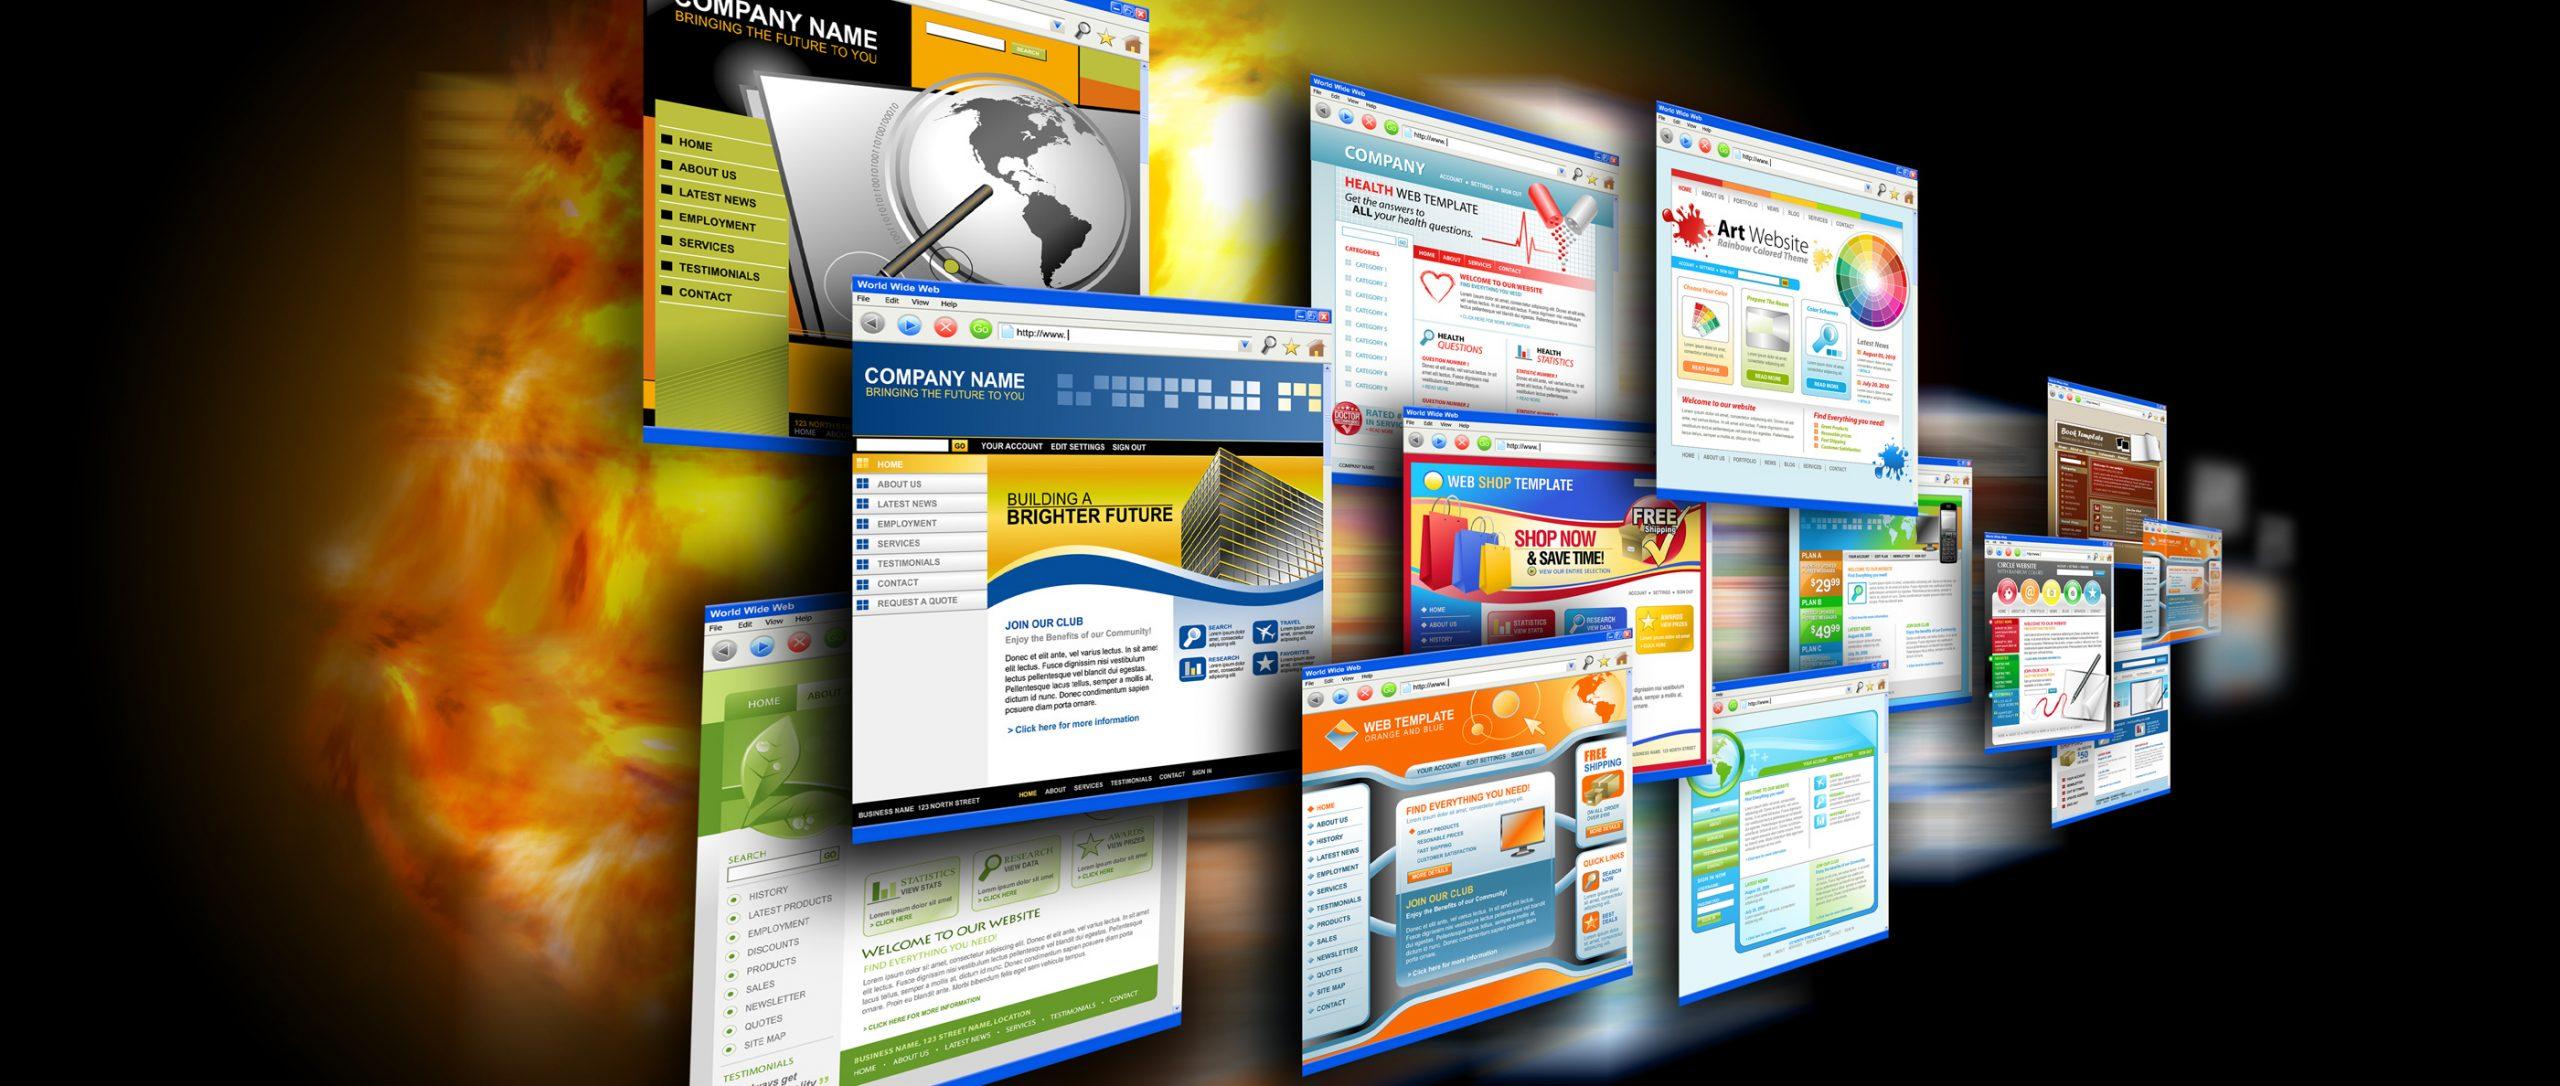 The Best Way To Brief A Web Design Supplier